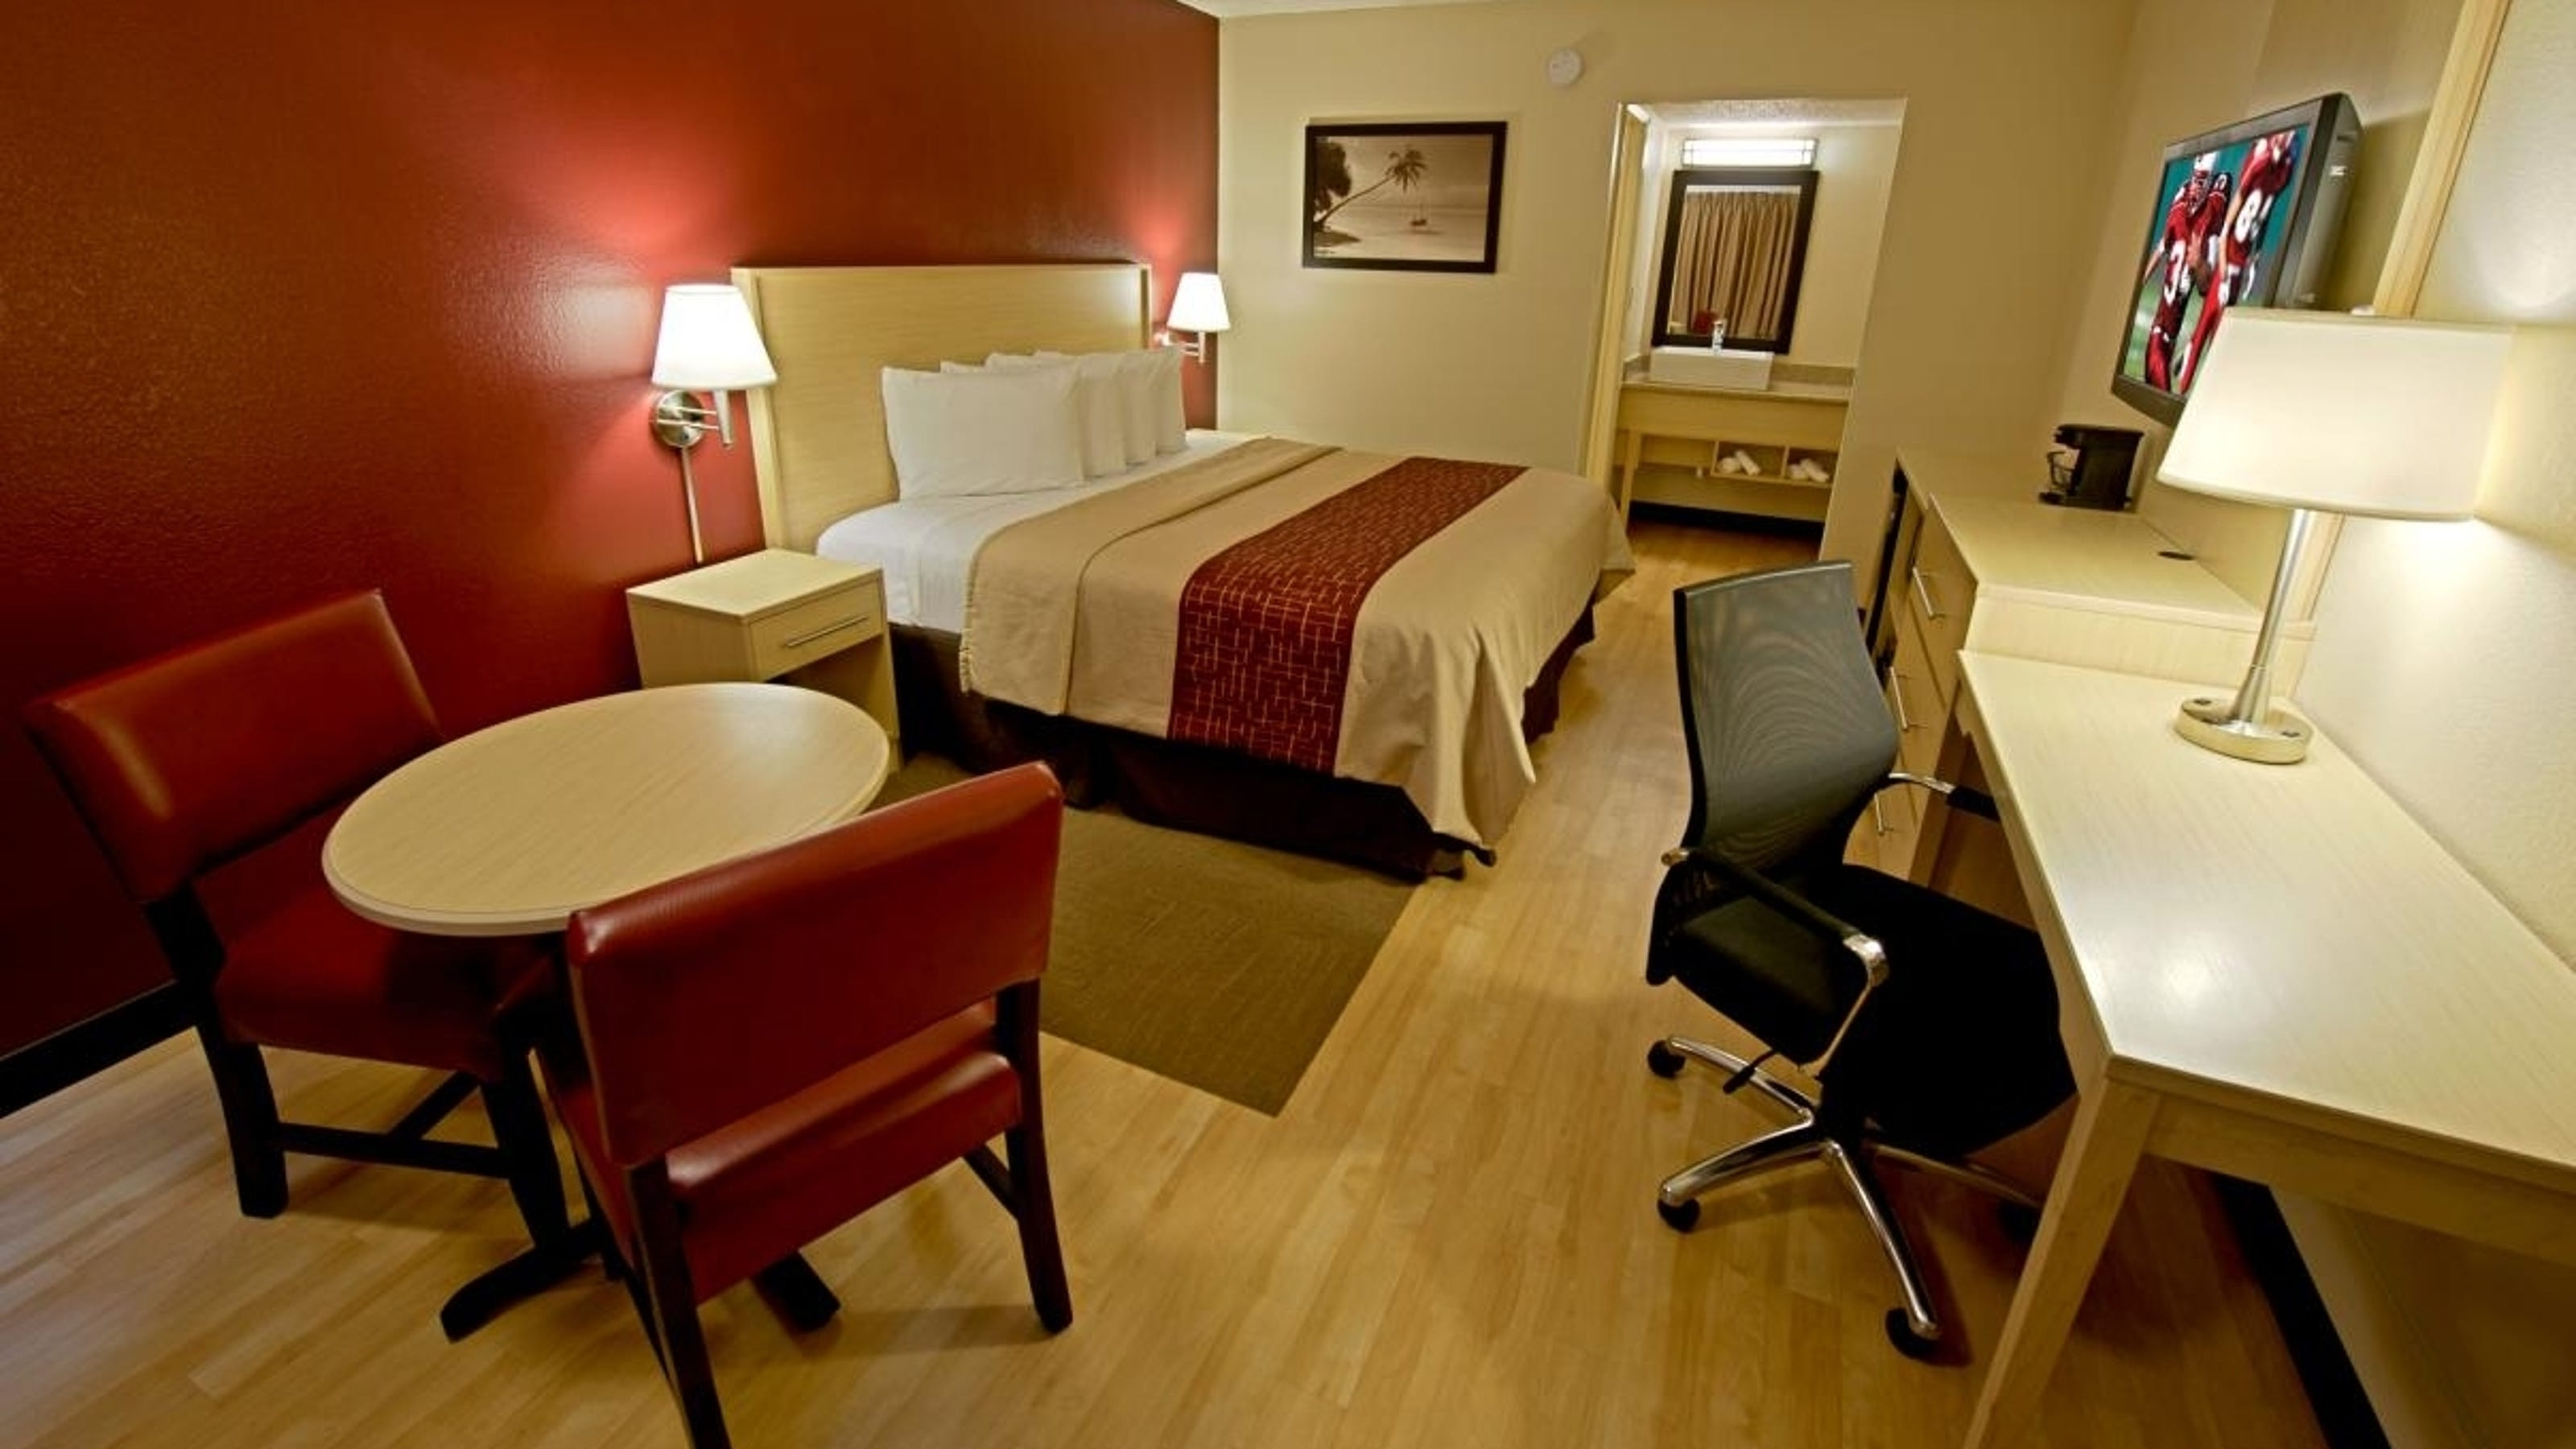 Hotel Websites Embrace Tripadvisor Bad Reviews And All